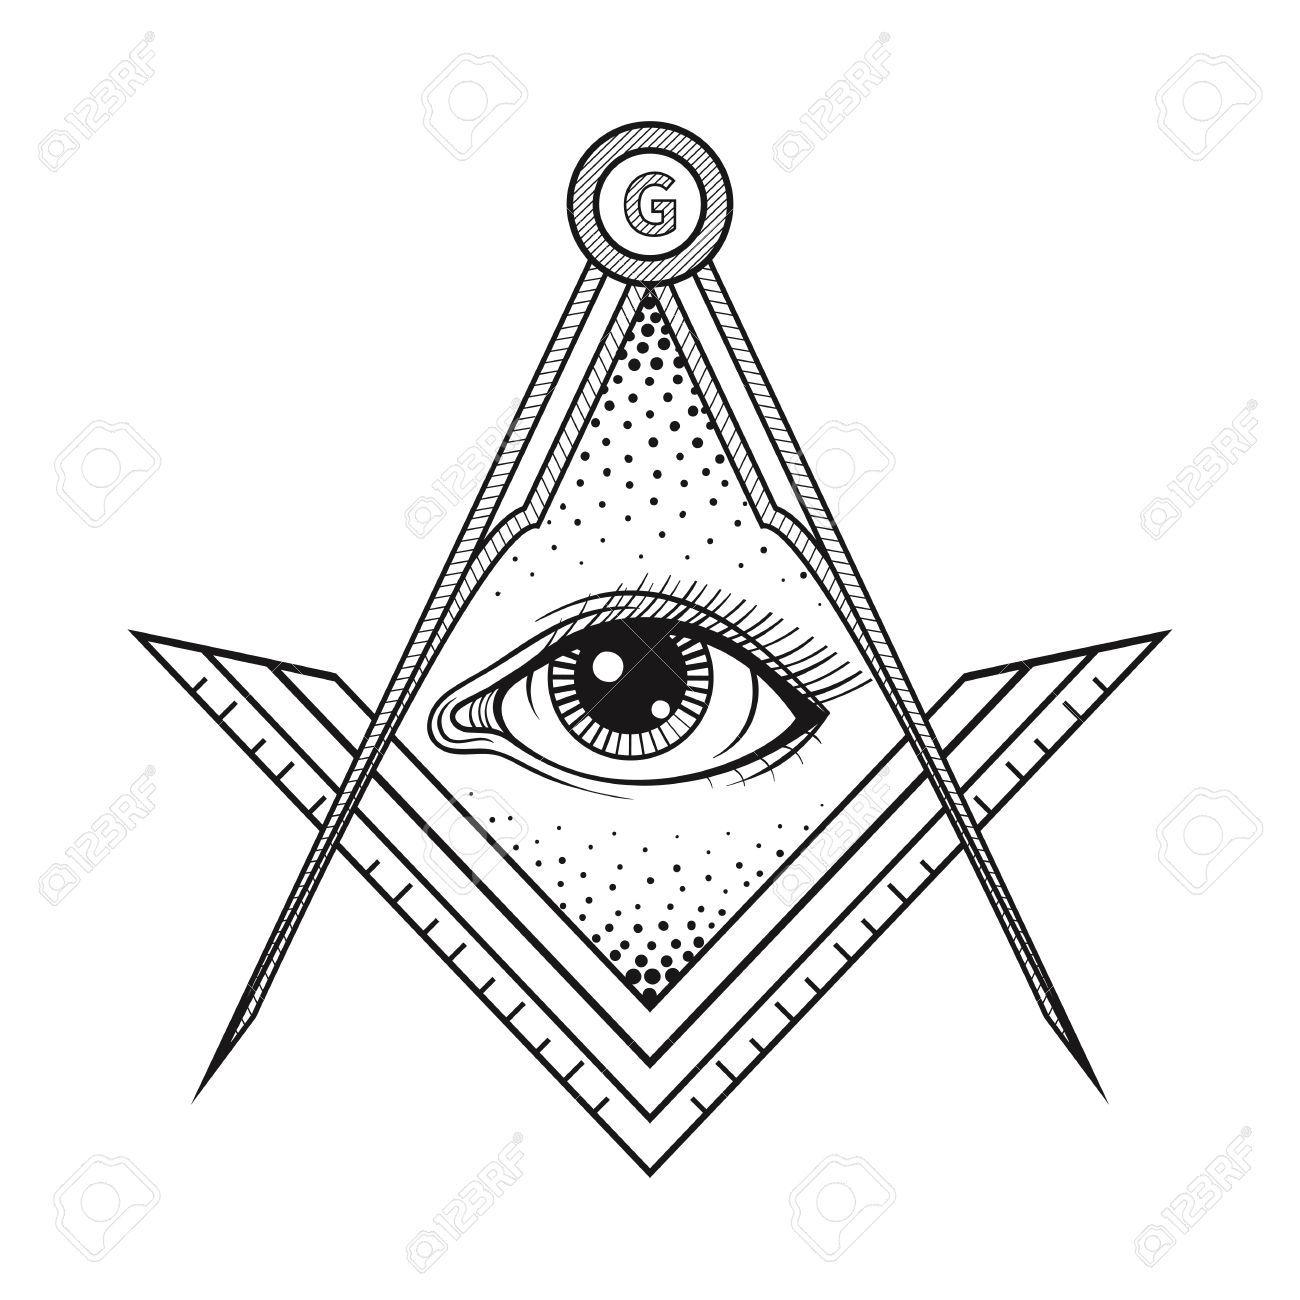 Symbole Franc Macon Recherche Google Franc Macon Tatouage Franc Macon Tatouage Avant Bras